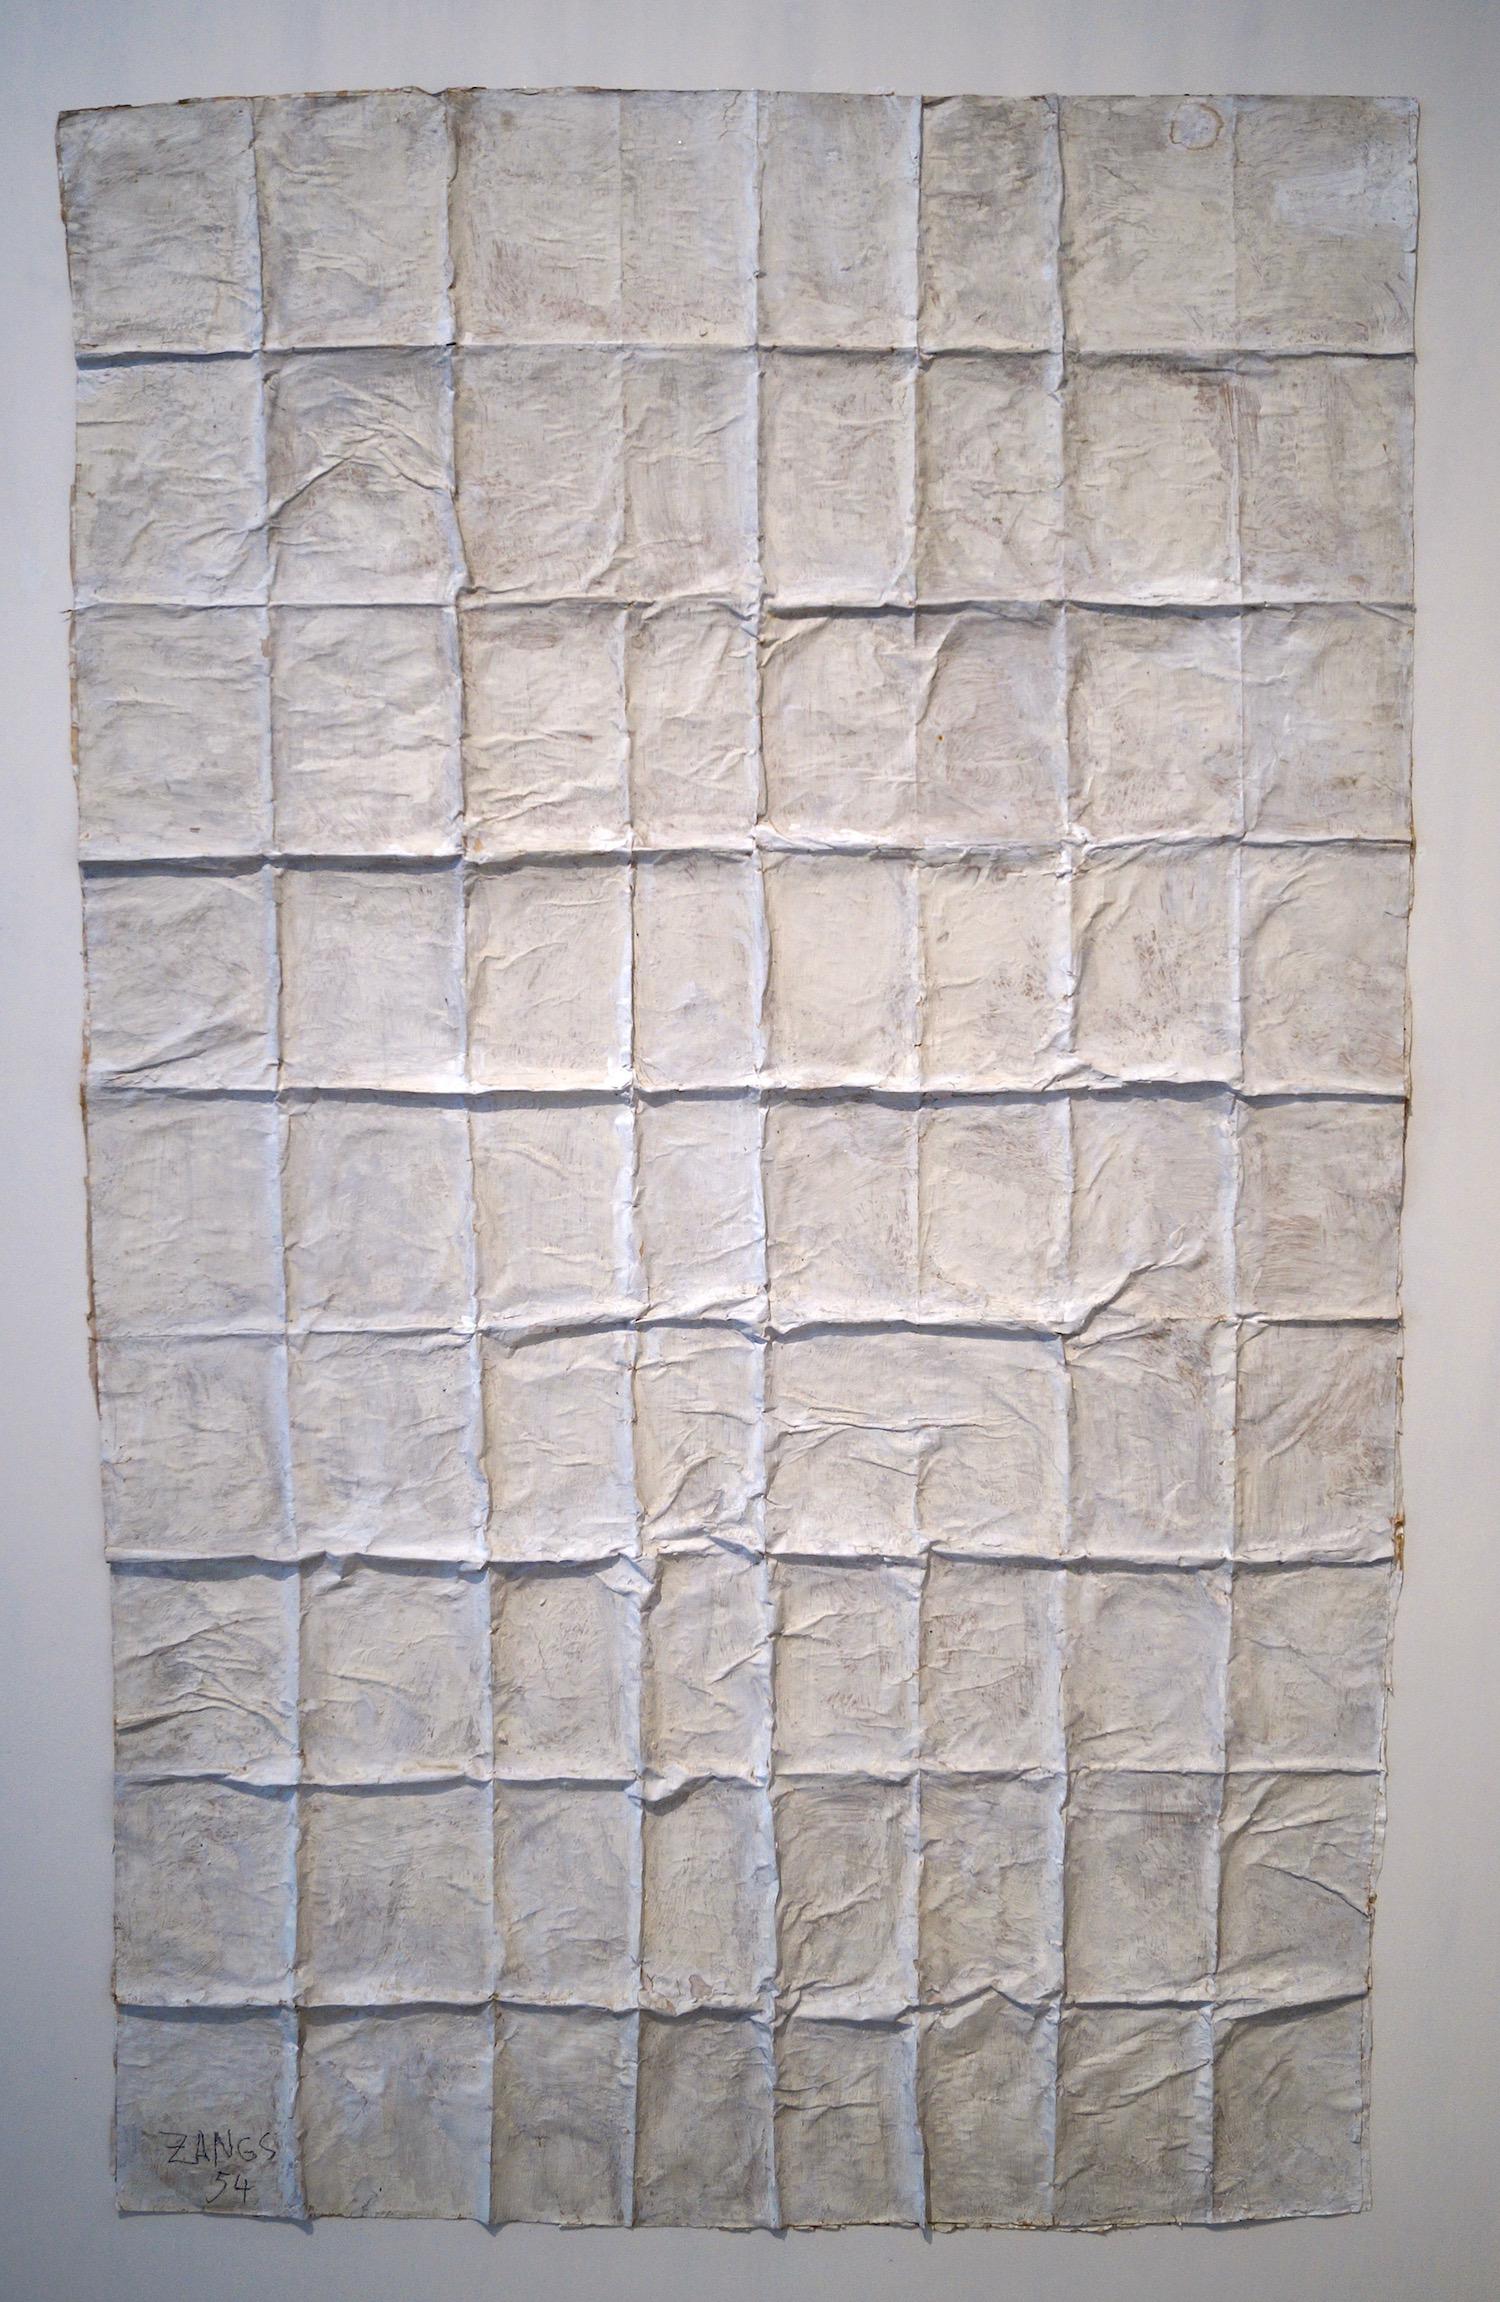 Herbert Zangs Folding, 1970er Jahre Folding of brown wrapping paper, mounted on brown wrapping paper, white painted. 133 x 80 cm | 52 1/3 x 31 1/2 in  HZ/M 4